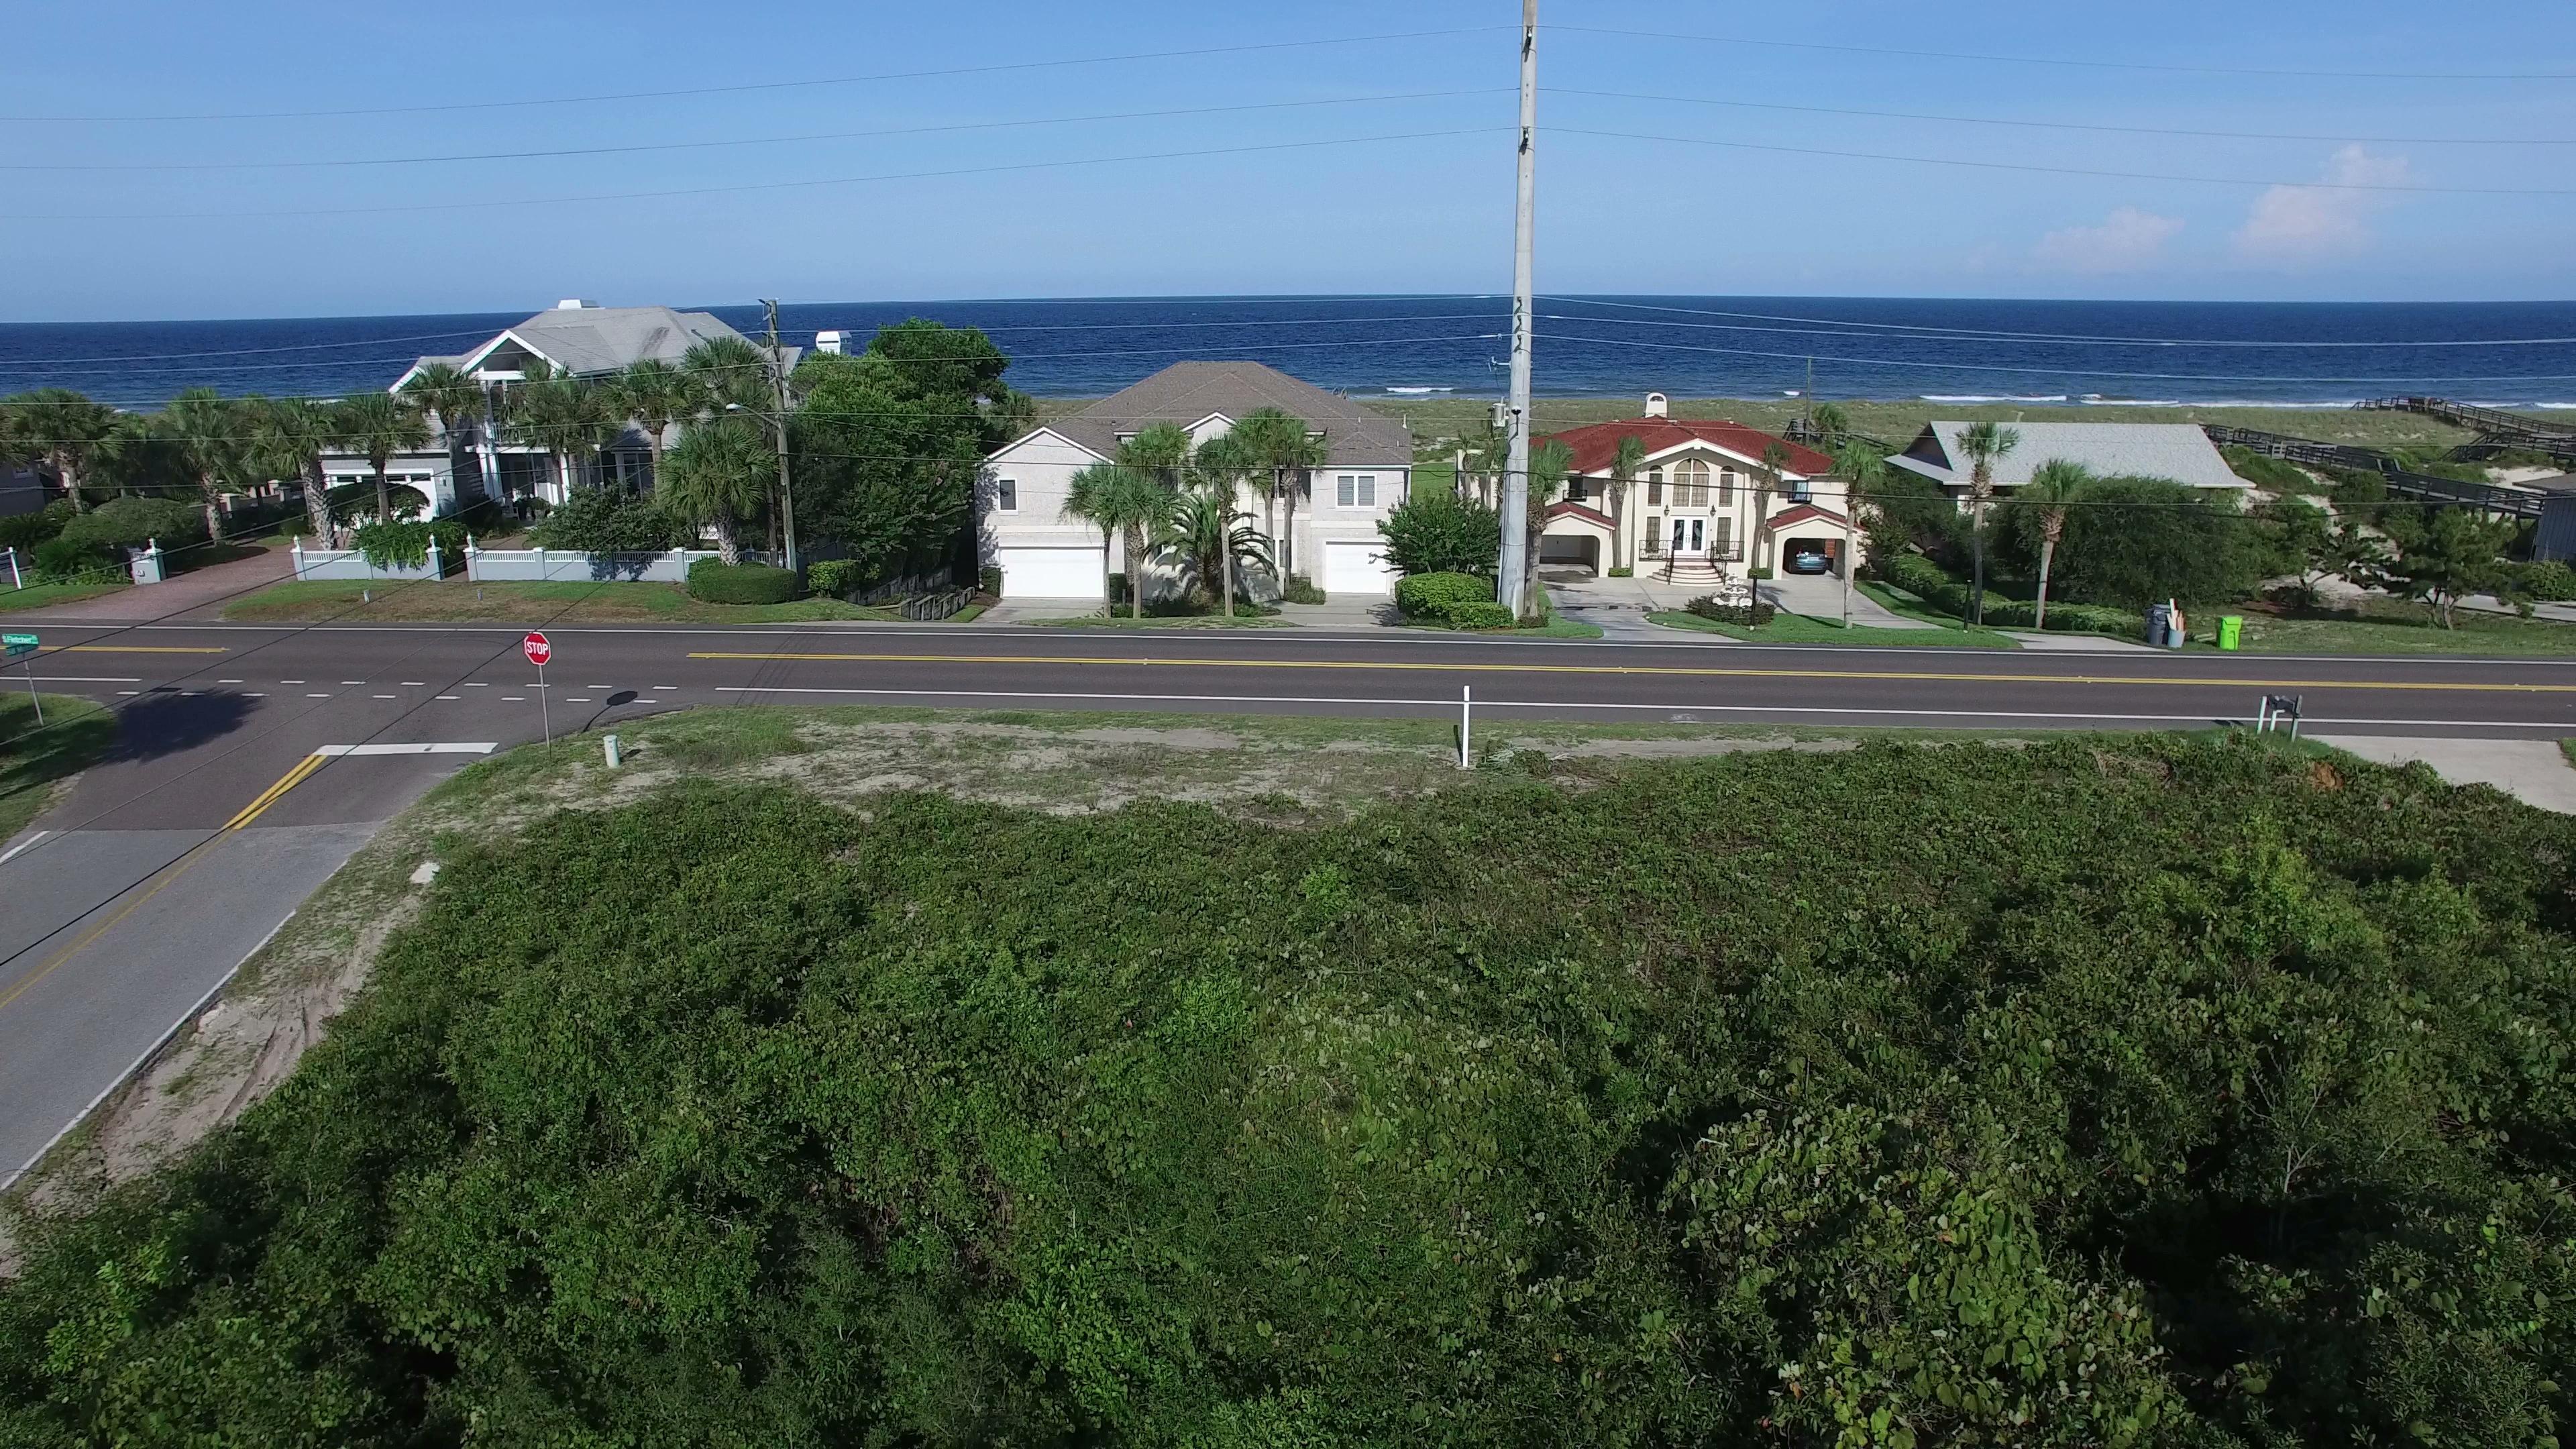 Land for Sale at 4053 S. Fletcher Ave. 4052 S. Fletcher Ave. Amelia Island, Florida 32034 United States